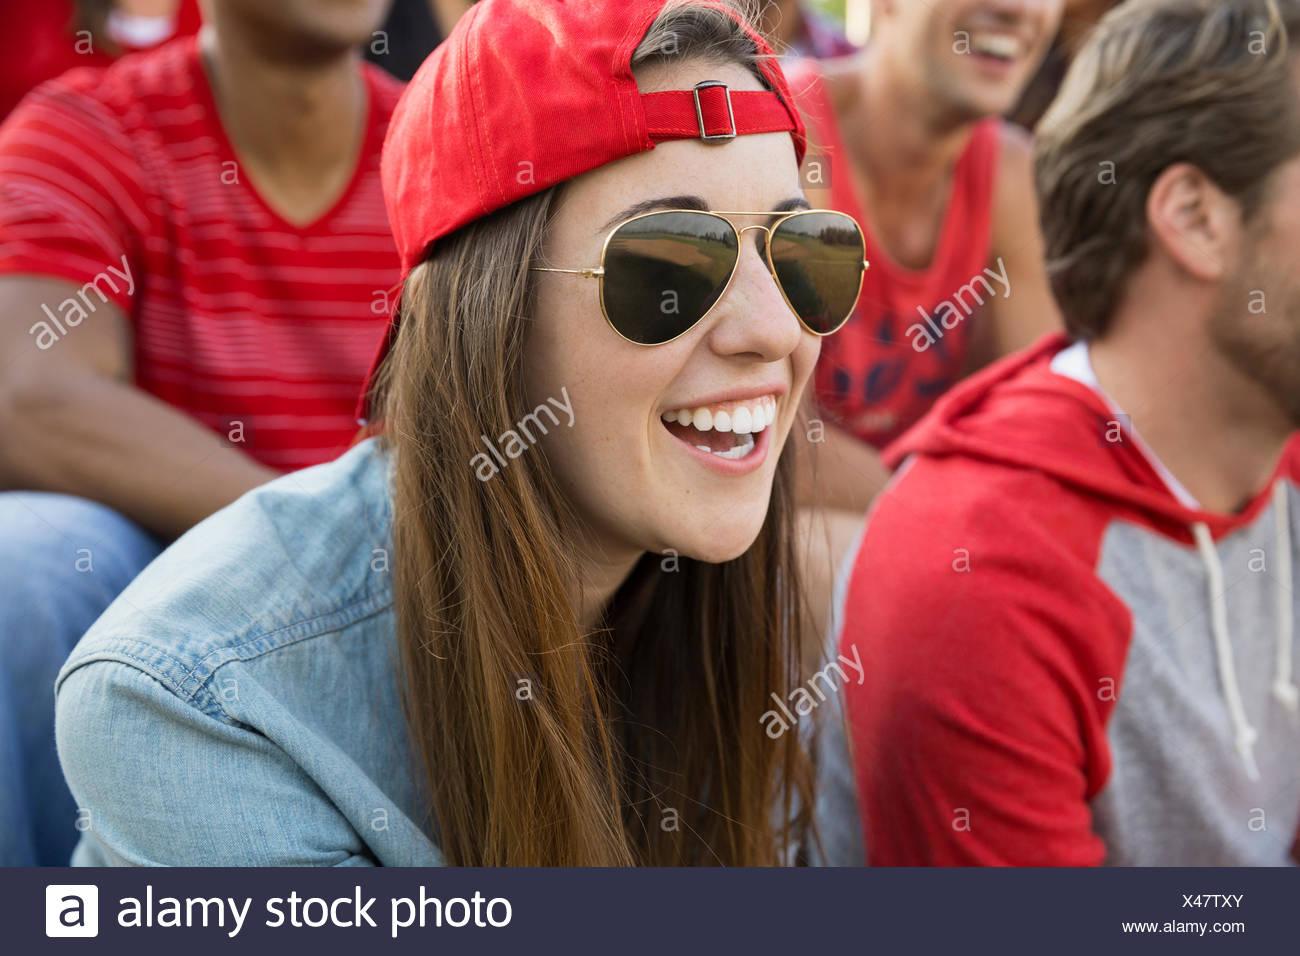 Bei Sportveranstaltung lachende Frau Stockbild